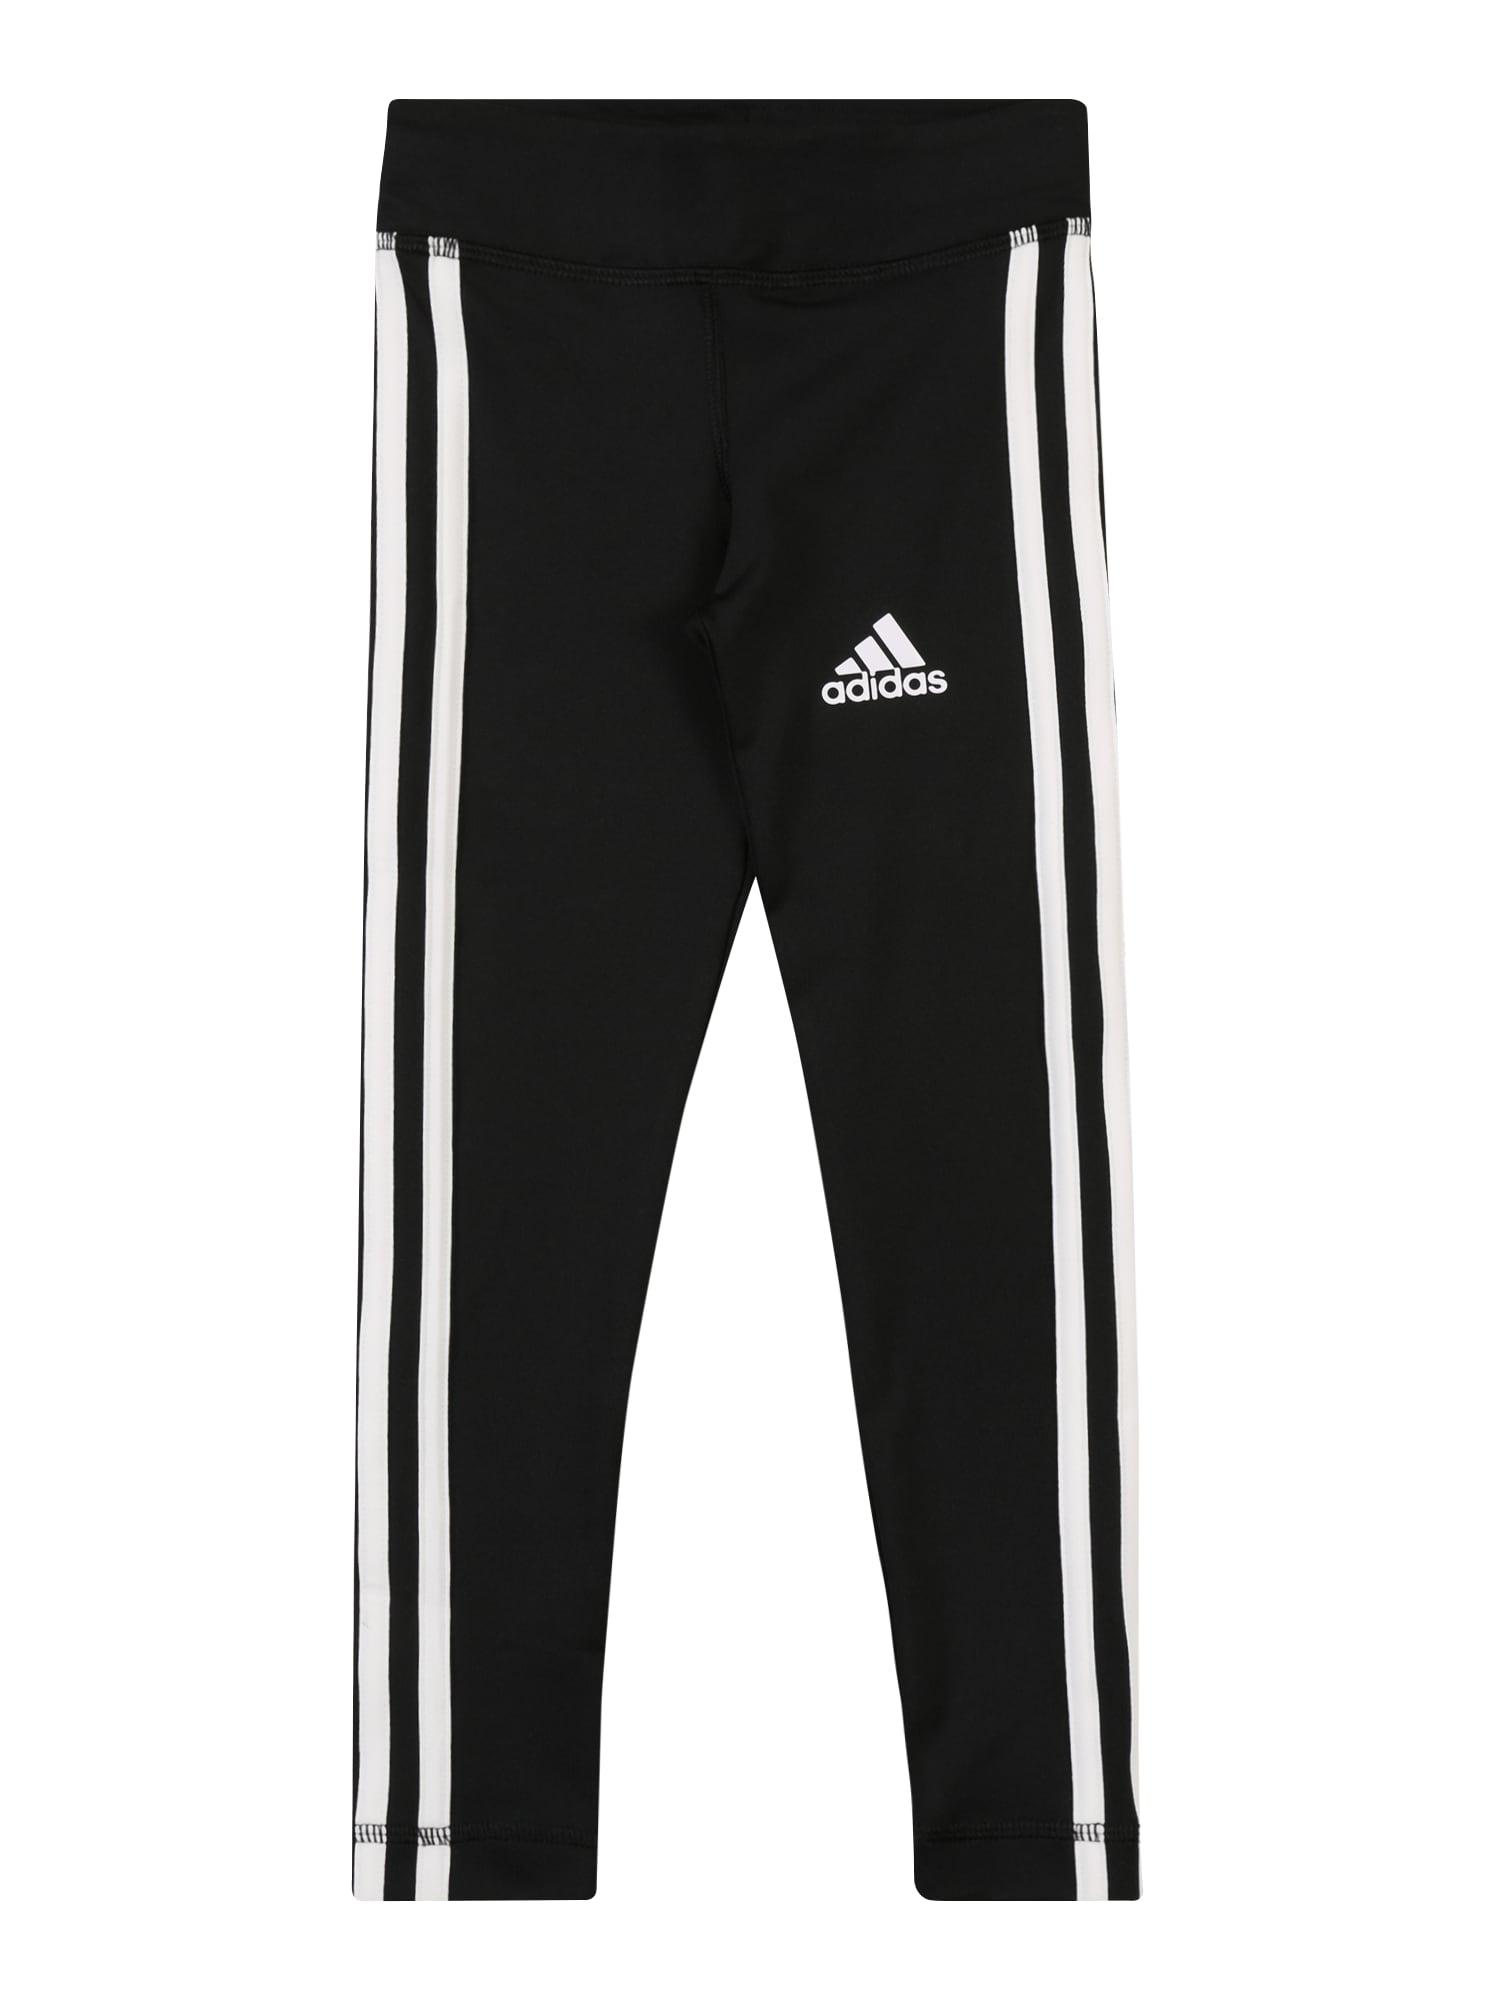 ADIDAS PERFORMANCE Sportinės kelnės 'YG TR EQ 3S L T' juoda